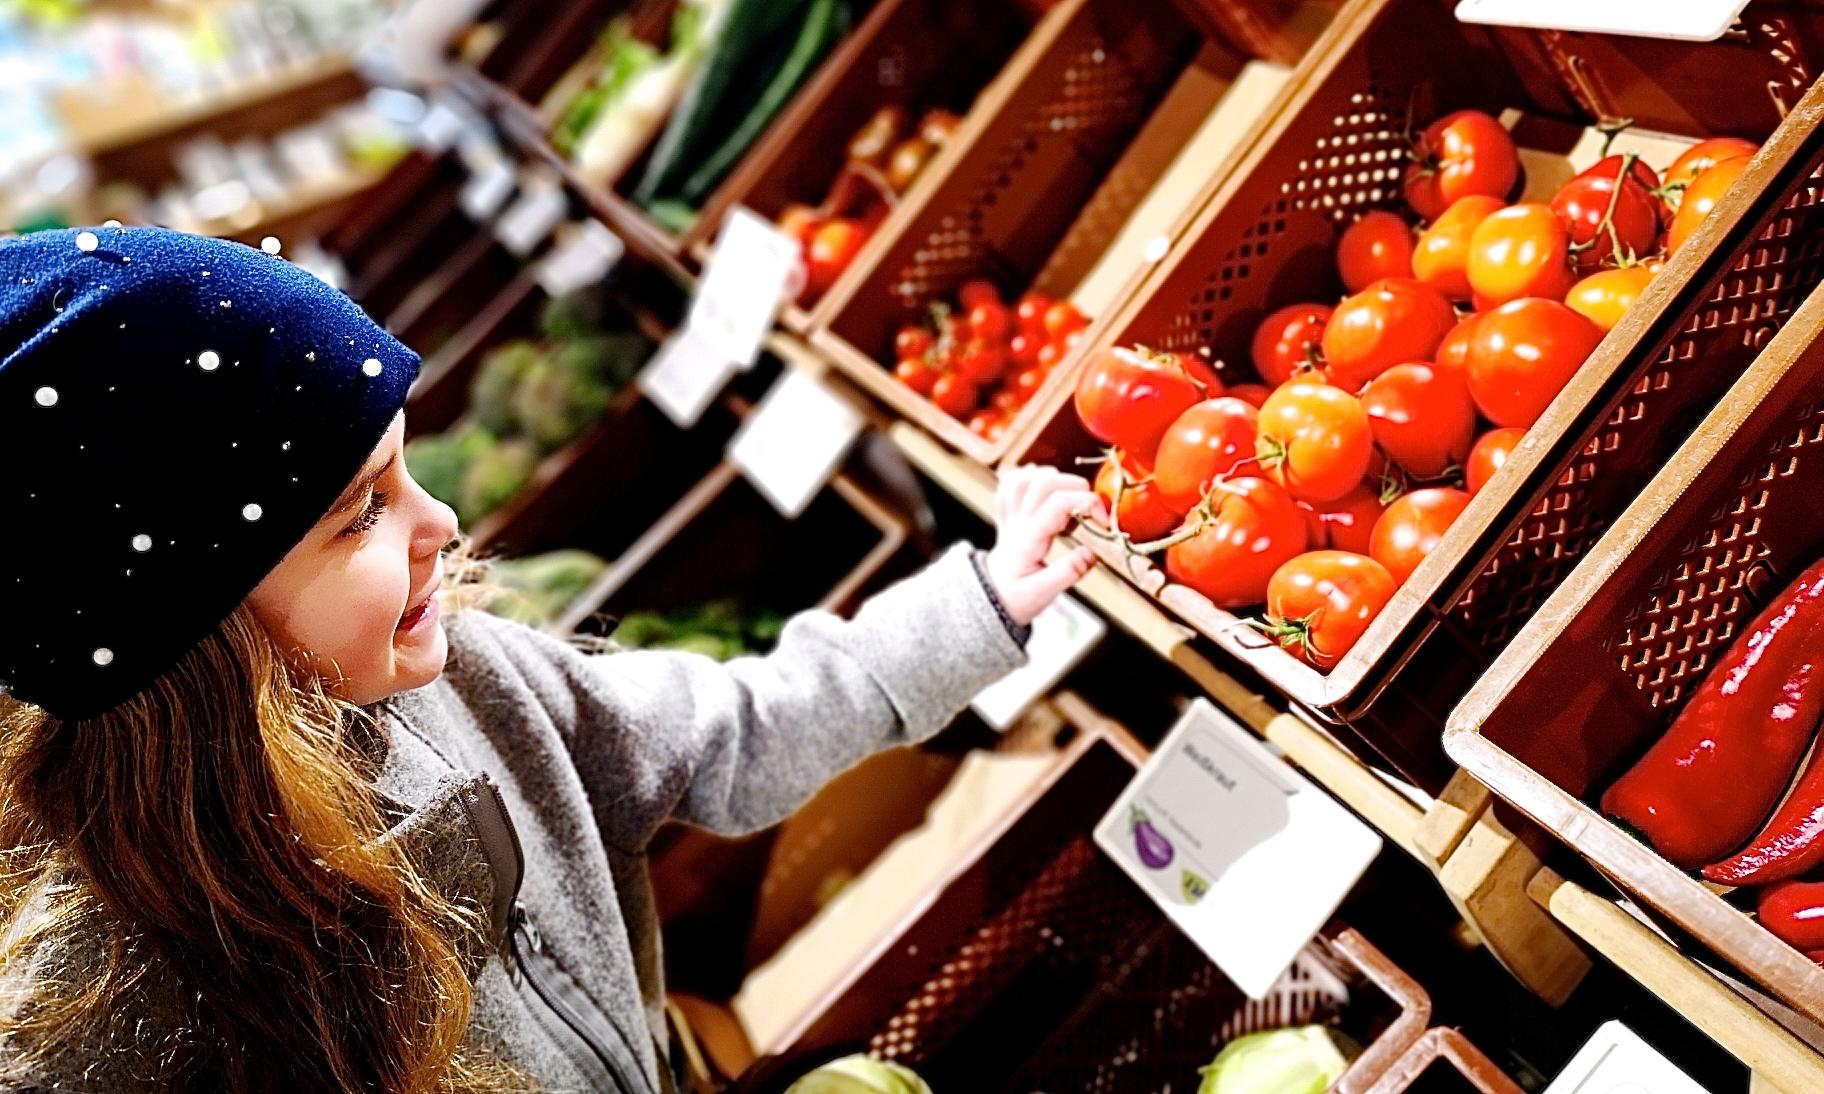 Mädchen vor dem Gemüseregal